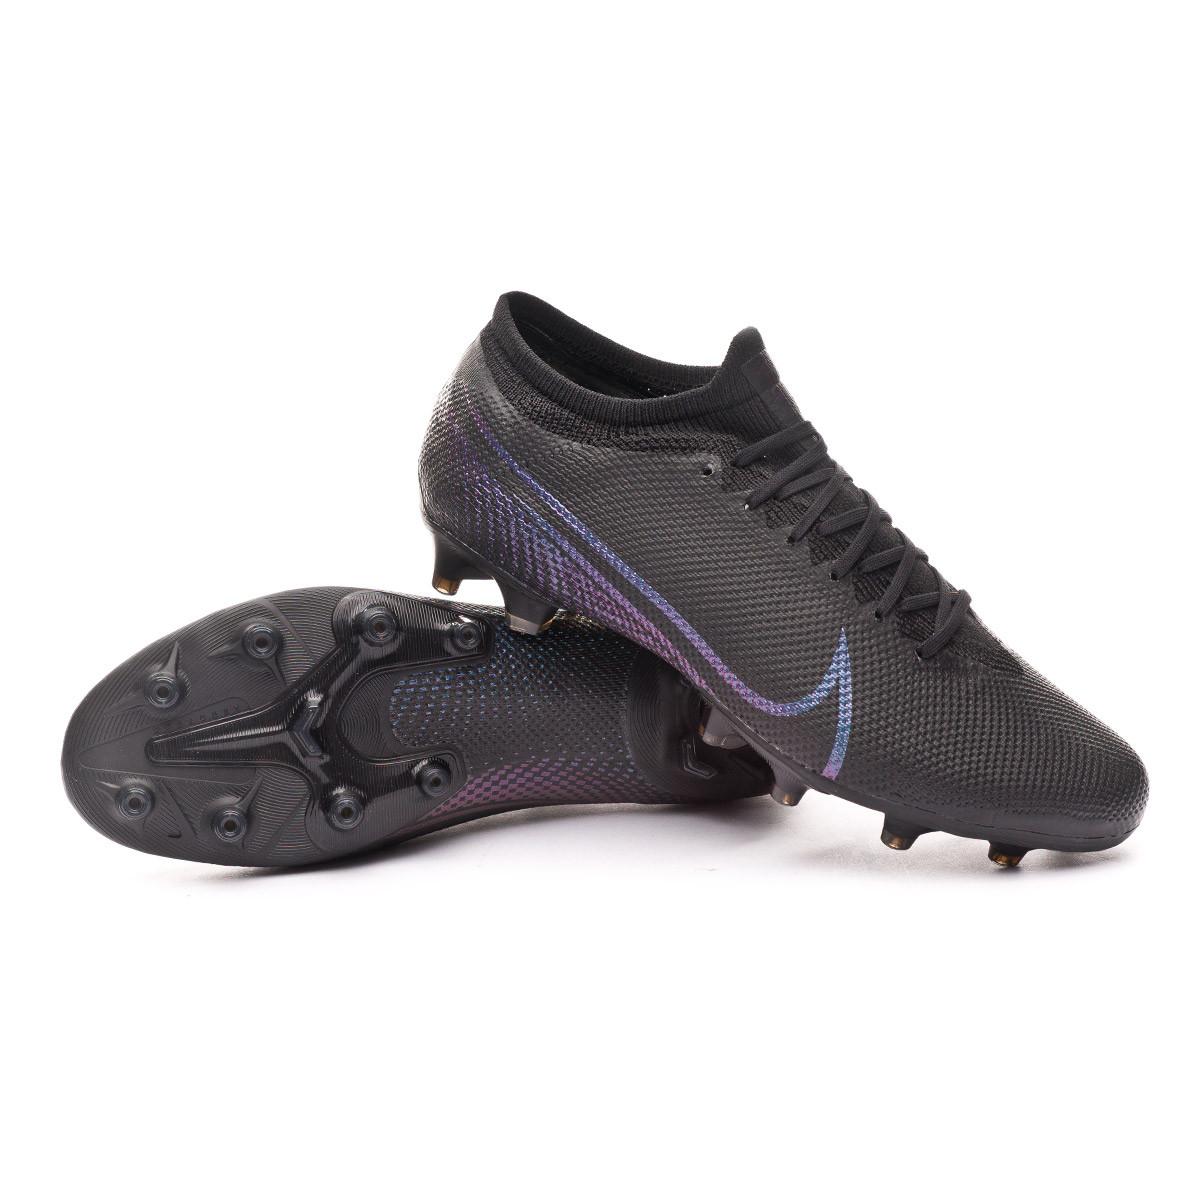 alfiler Respeto a ti mismo Arturo  Football Boots Nike Mercurial Vapor XIII Pro AG-PRO Black - Football store  Fútbol Emotion